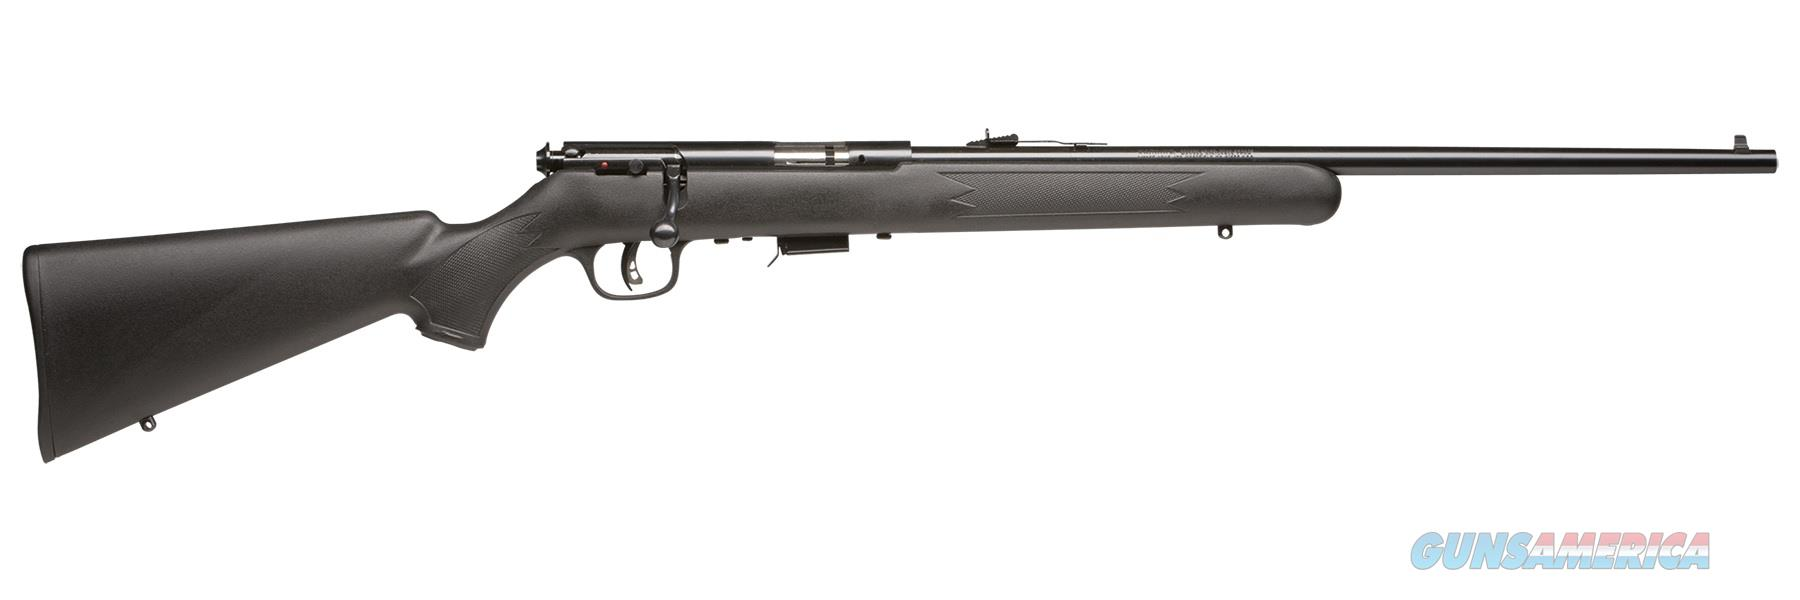 "Savage Mark II F Bolt-Action .22 LR 20.75"" 26700  Guns > Rifles > Savage Rifles > Other"